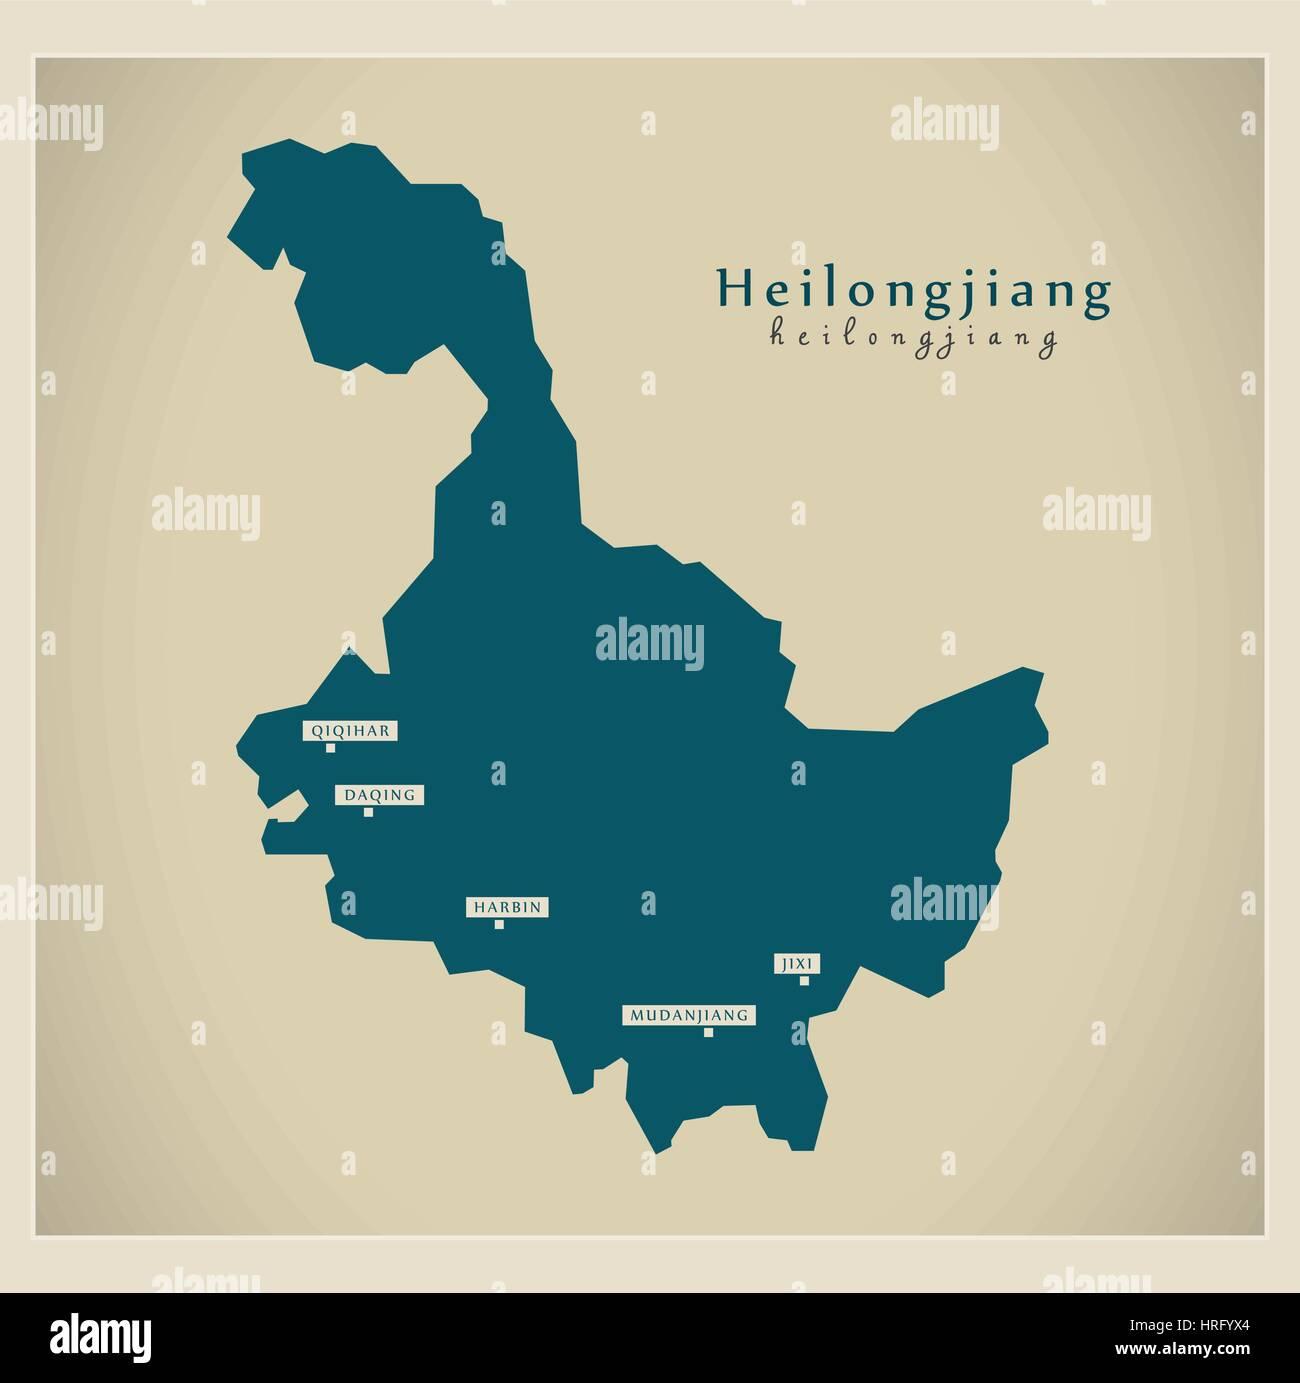 Modern Map - Heilongjiang - Stock Image